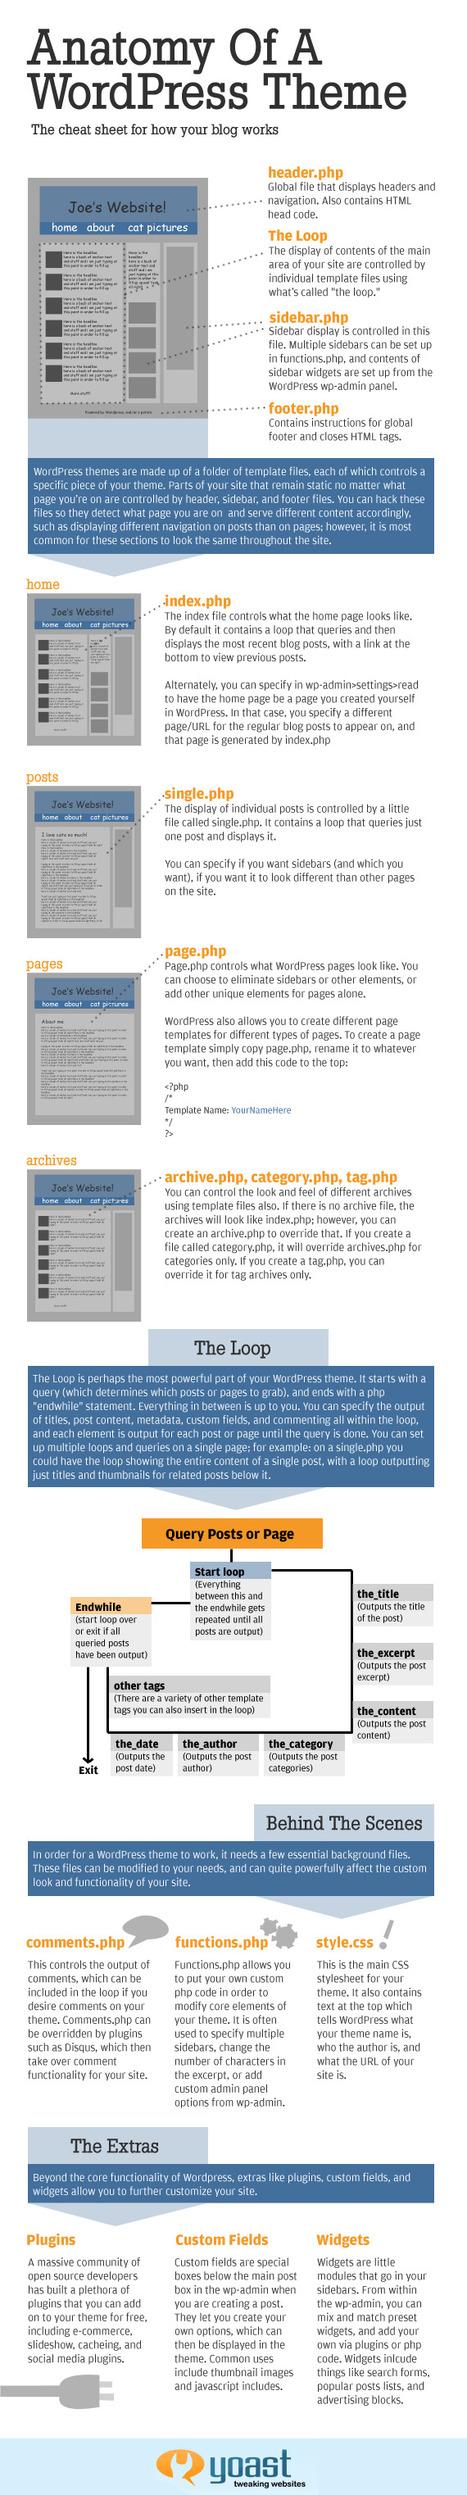 WordPress theme - The Anatomy, an Infographic - Yoast | Optimisation | Scoop.it